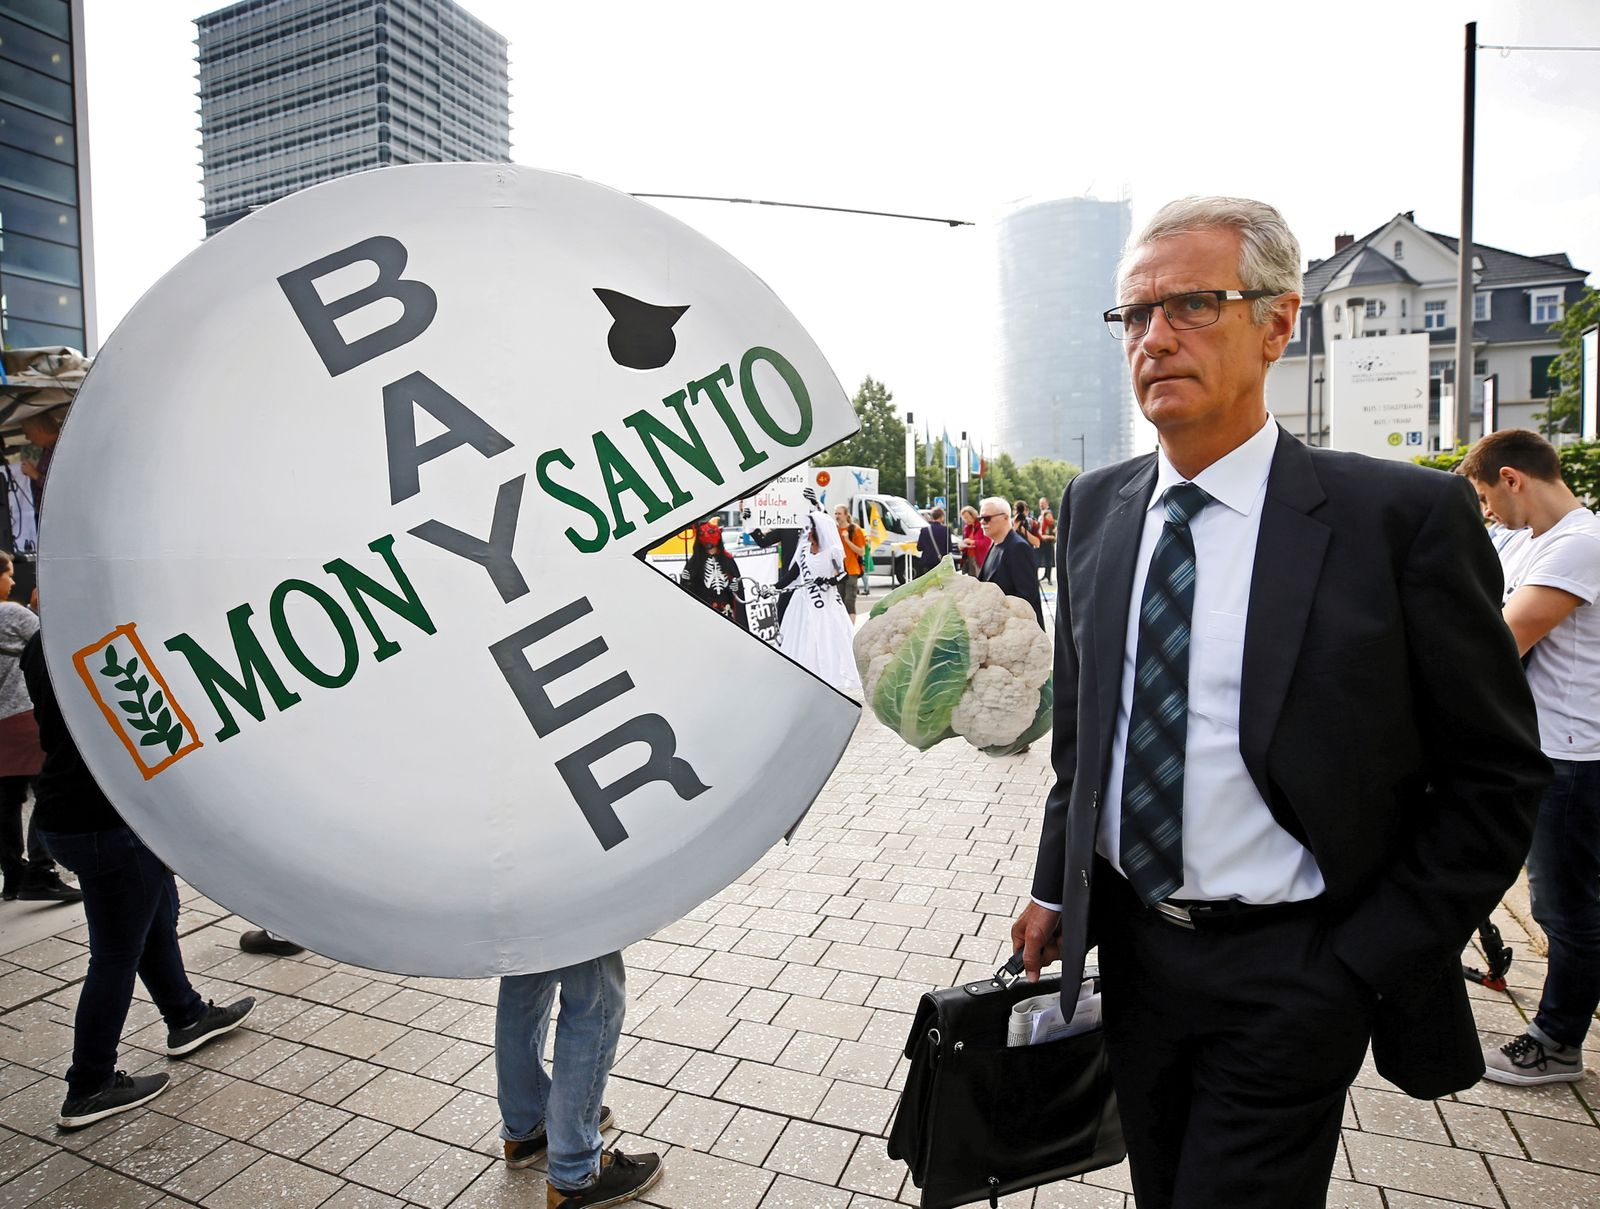 A Bayer's shareholder arrives at the annual general shareholders meeting in Bonn